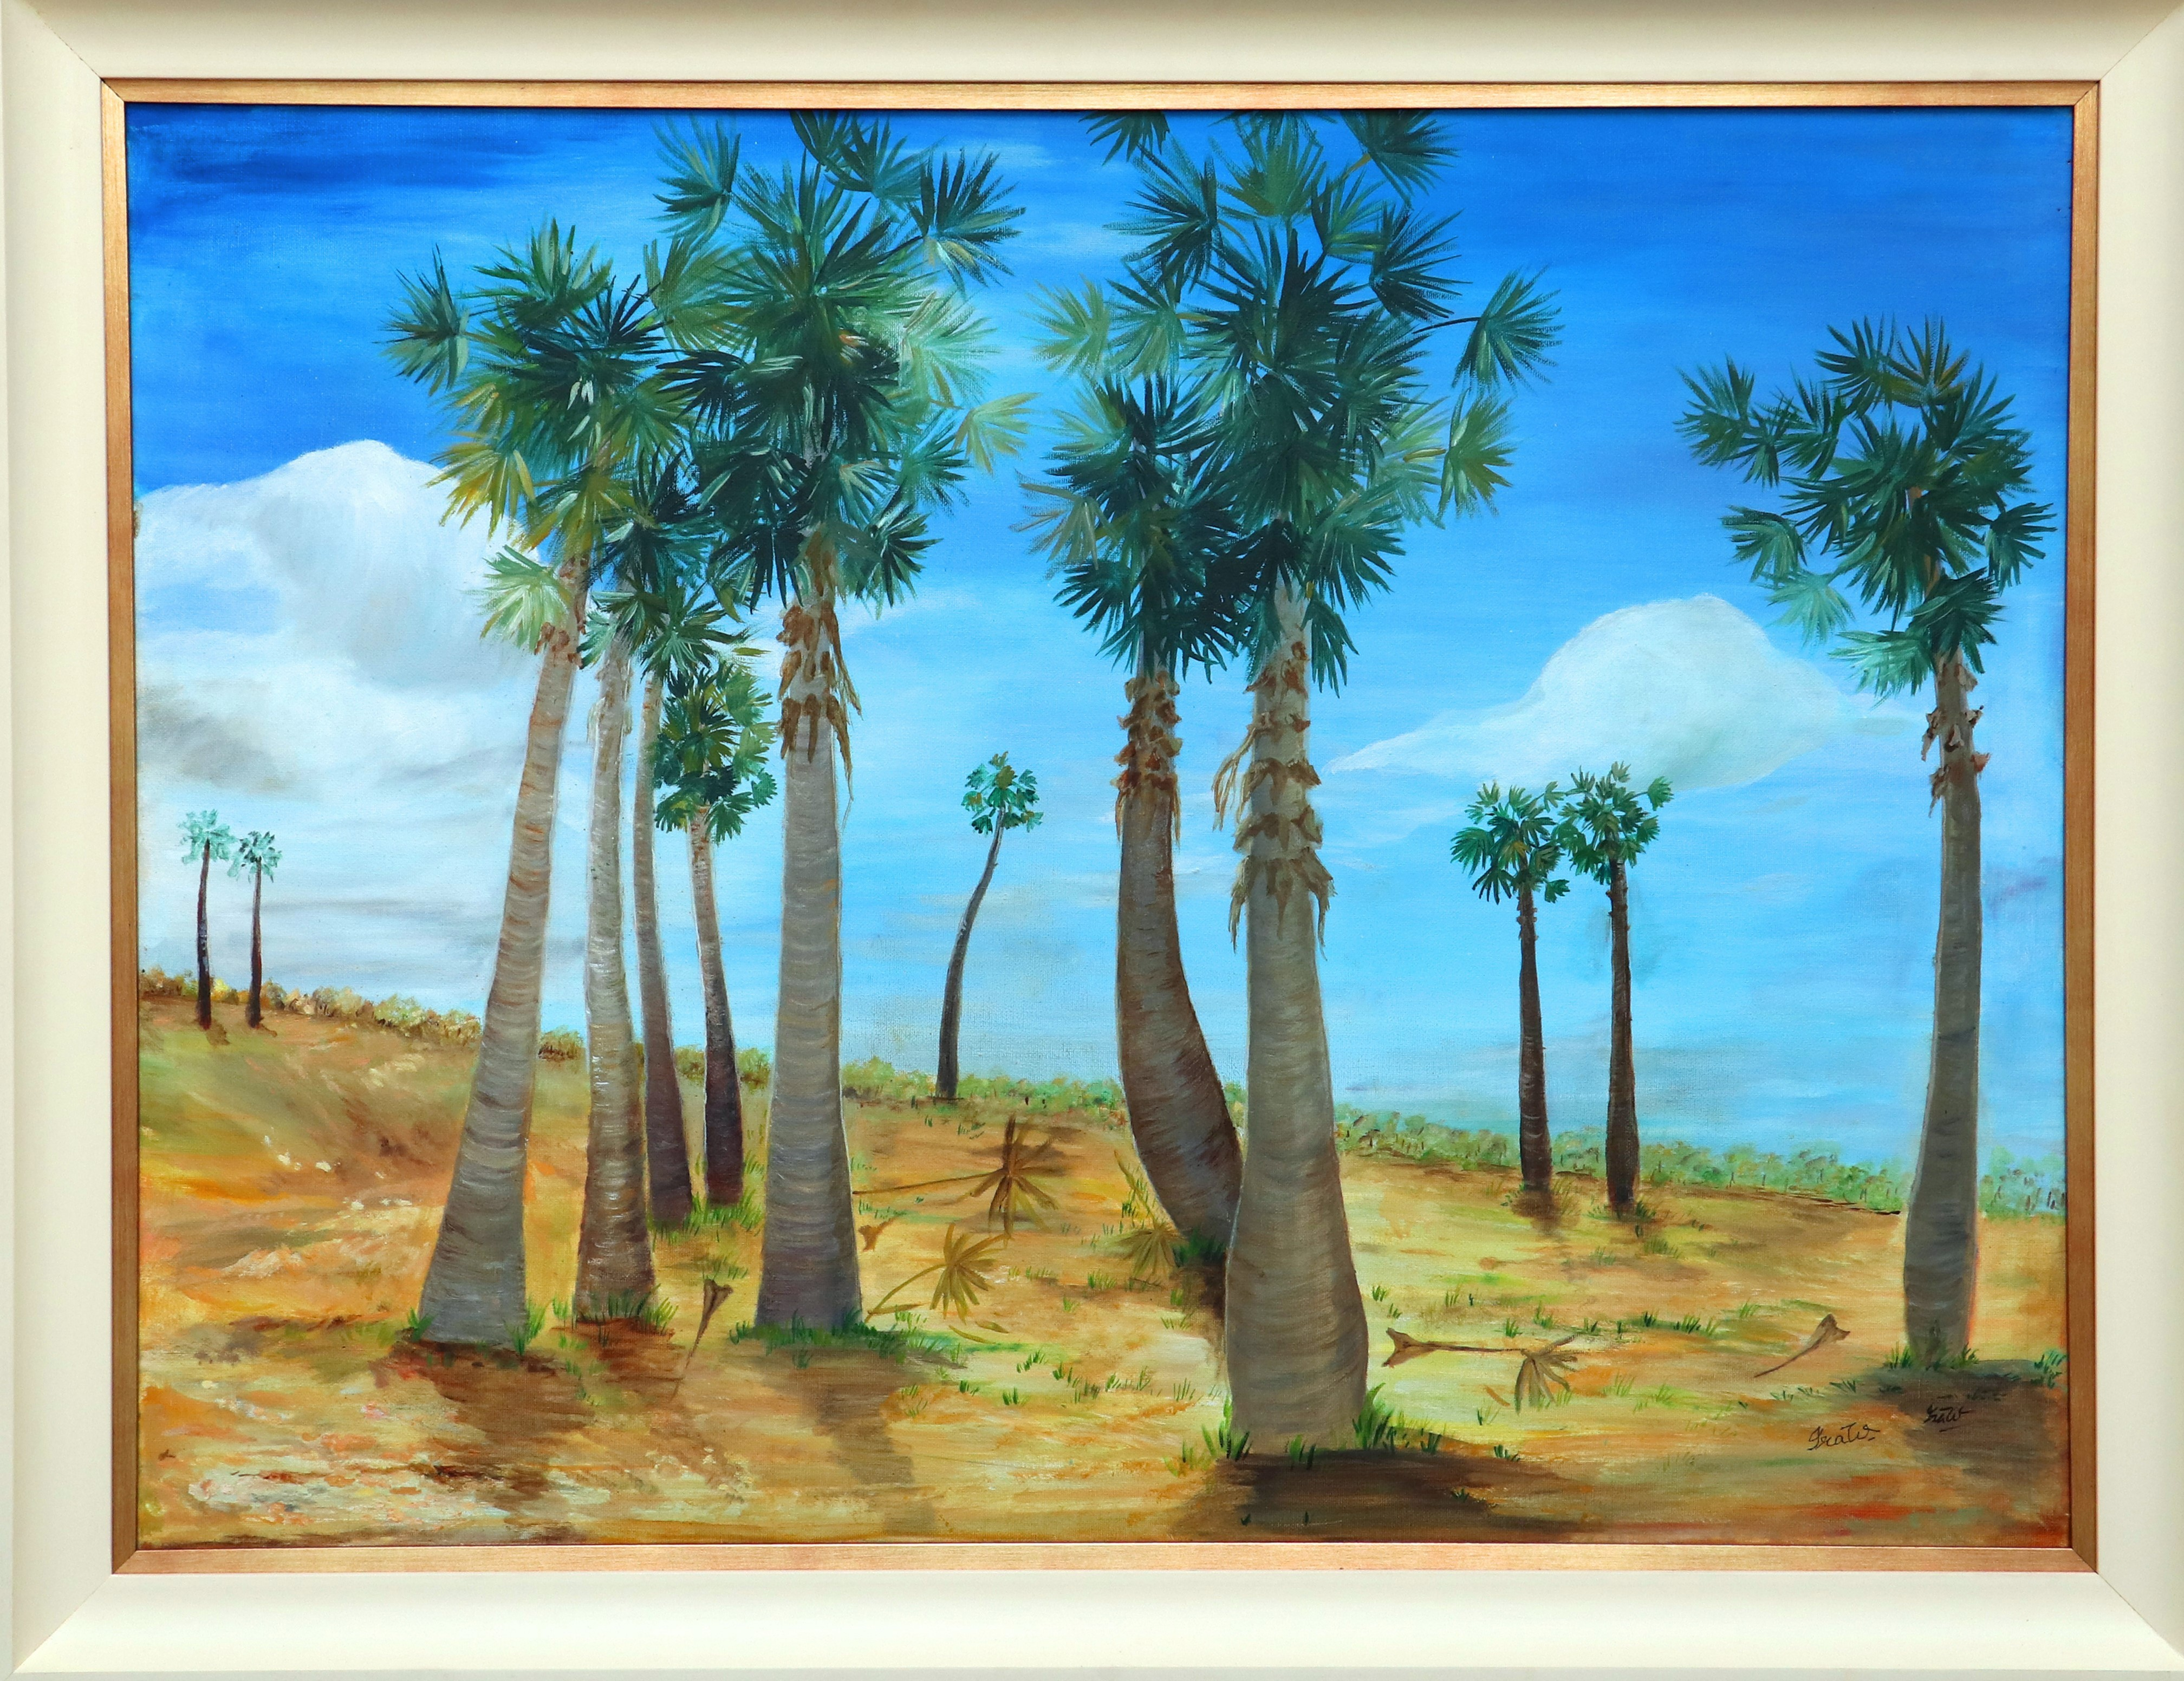 Palmyrahs in the North by Iranganie Wickramasinghe